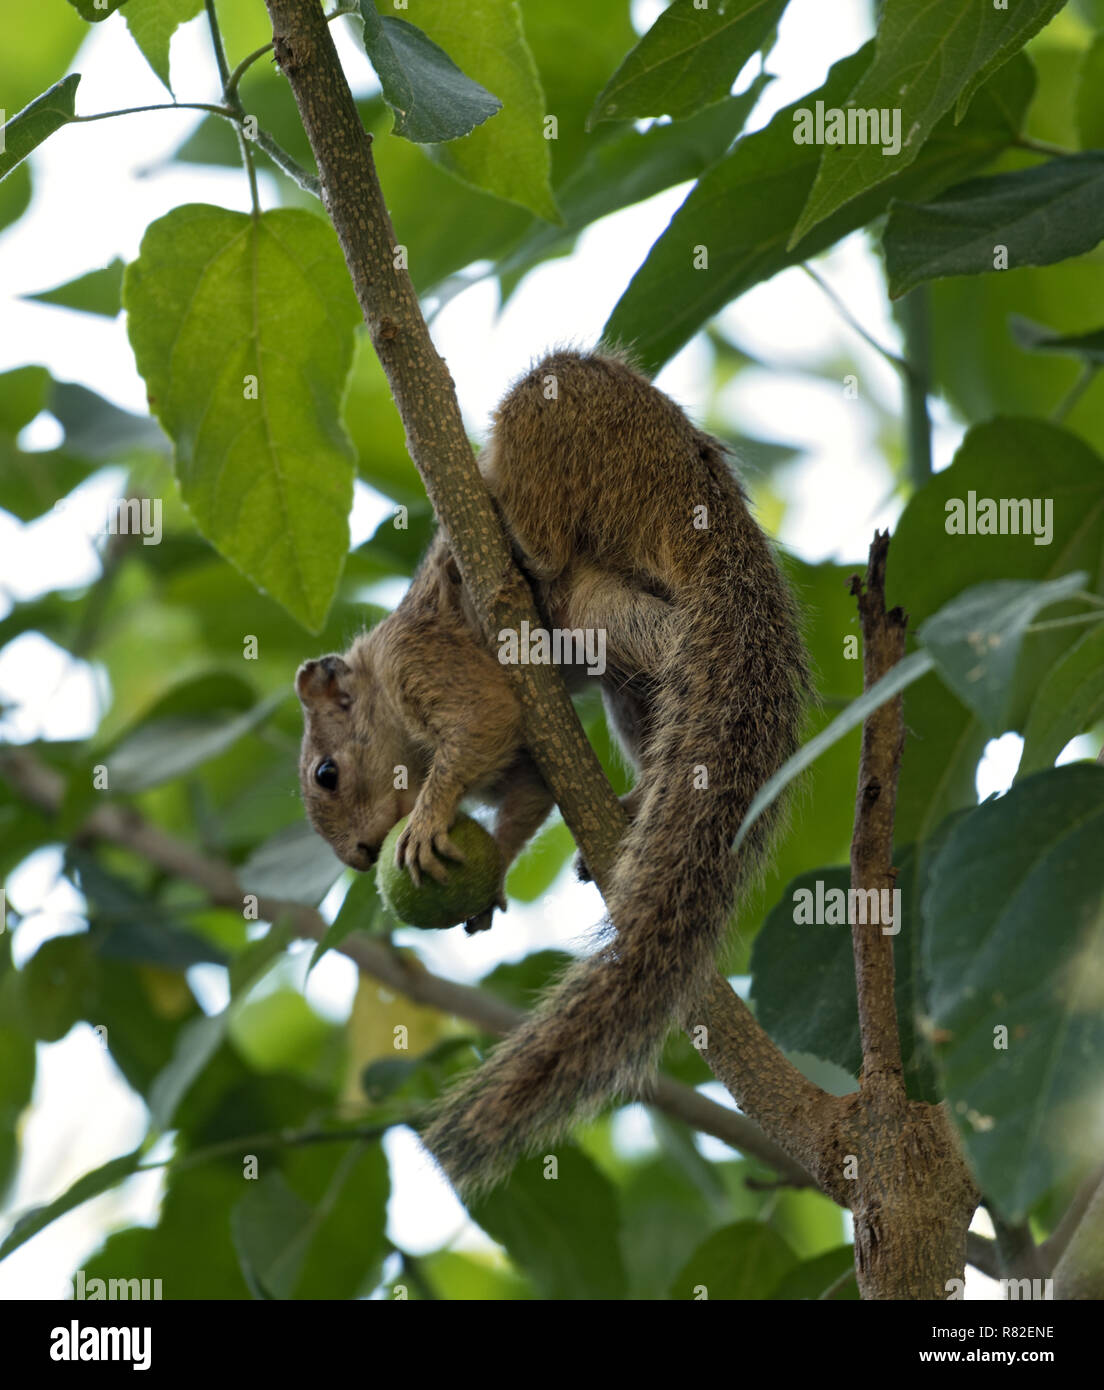 Tree squirrel (Paraxerus cepapi) sitting eating in a tree, Maun, Botswana - Stock Image